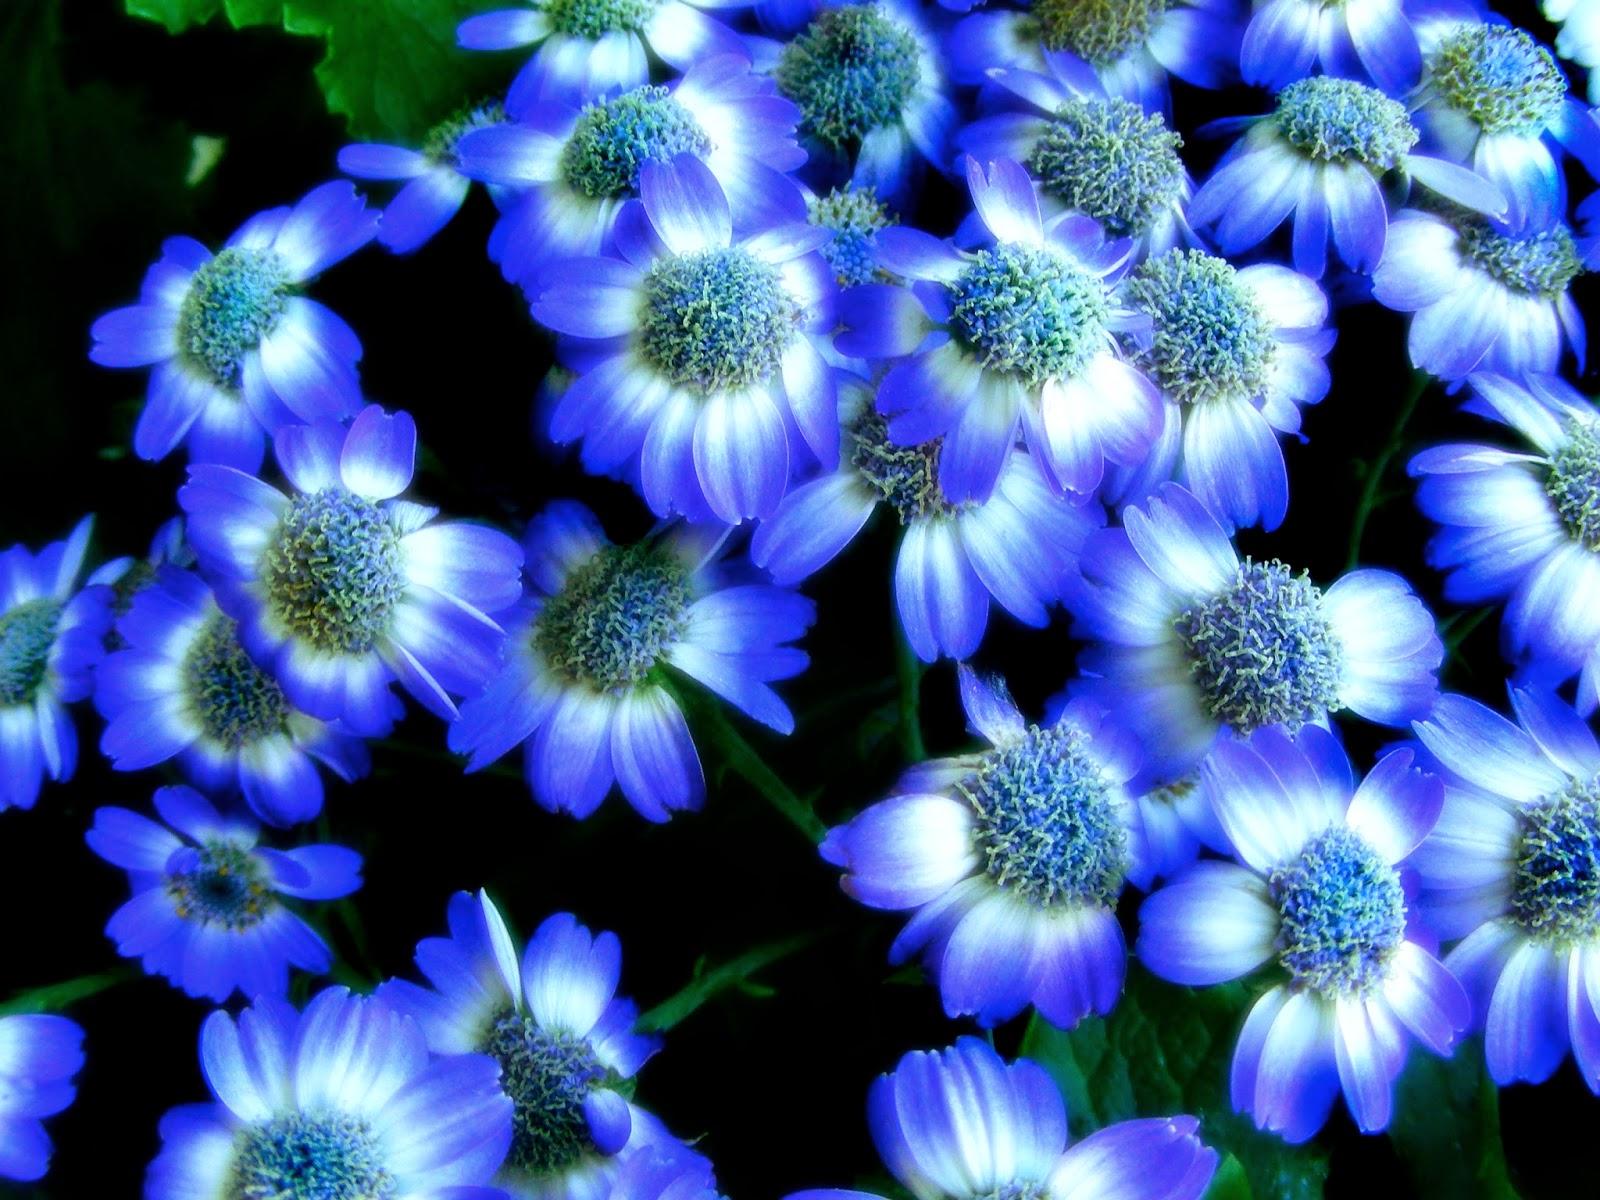 Random Lovely Flowers Wallpaper Desktop Background Full Screen Hd Wallpaper For Flowers 2880551 Hd Wallpaper Backgrounds Download